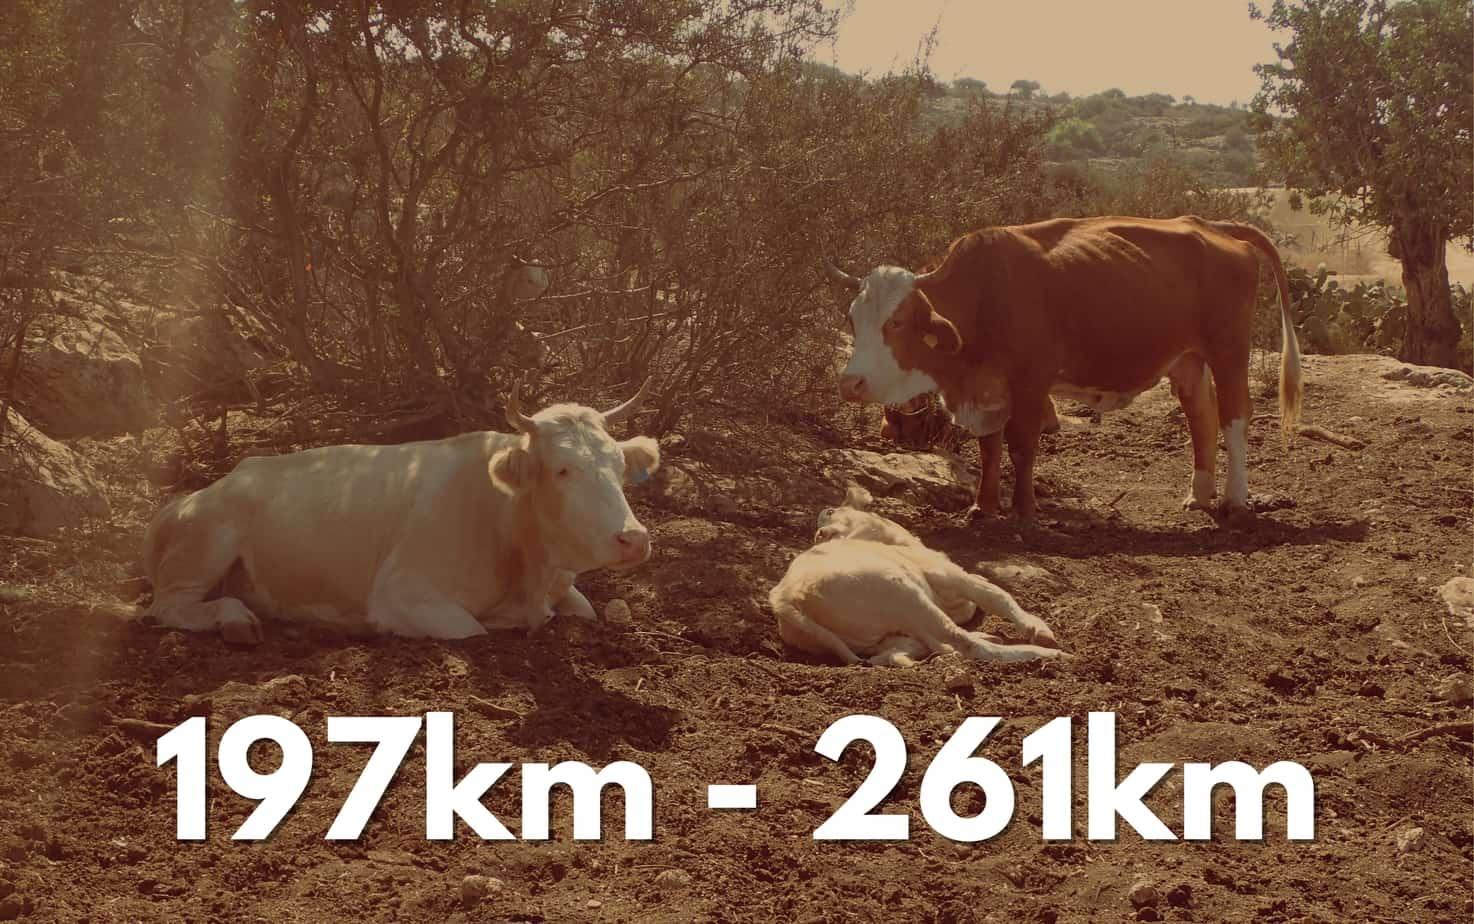 197-261km